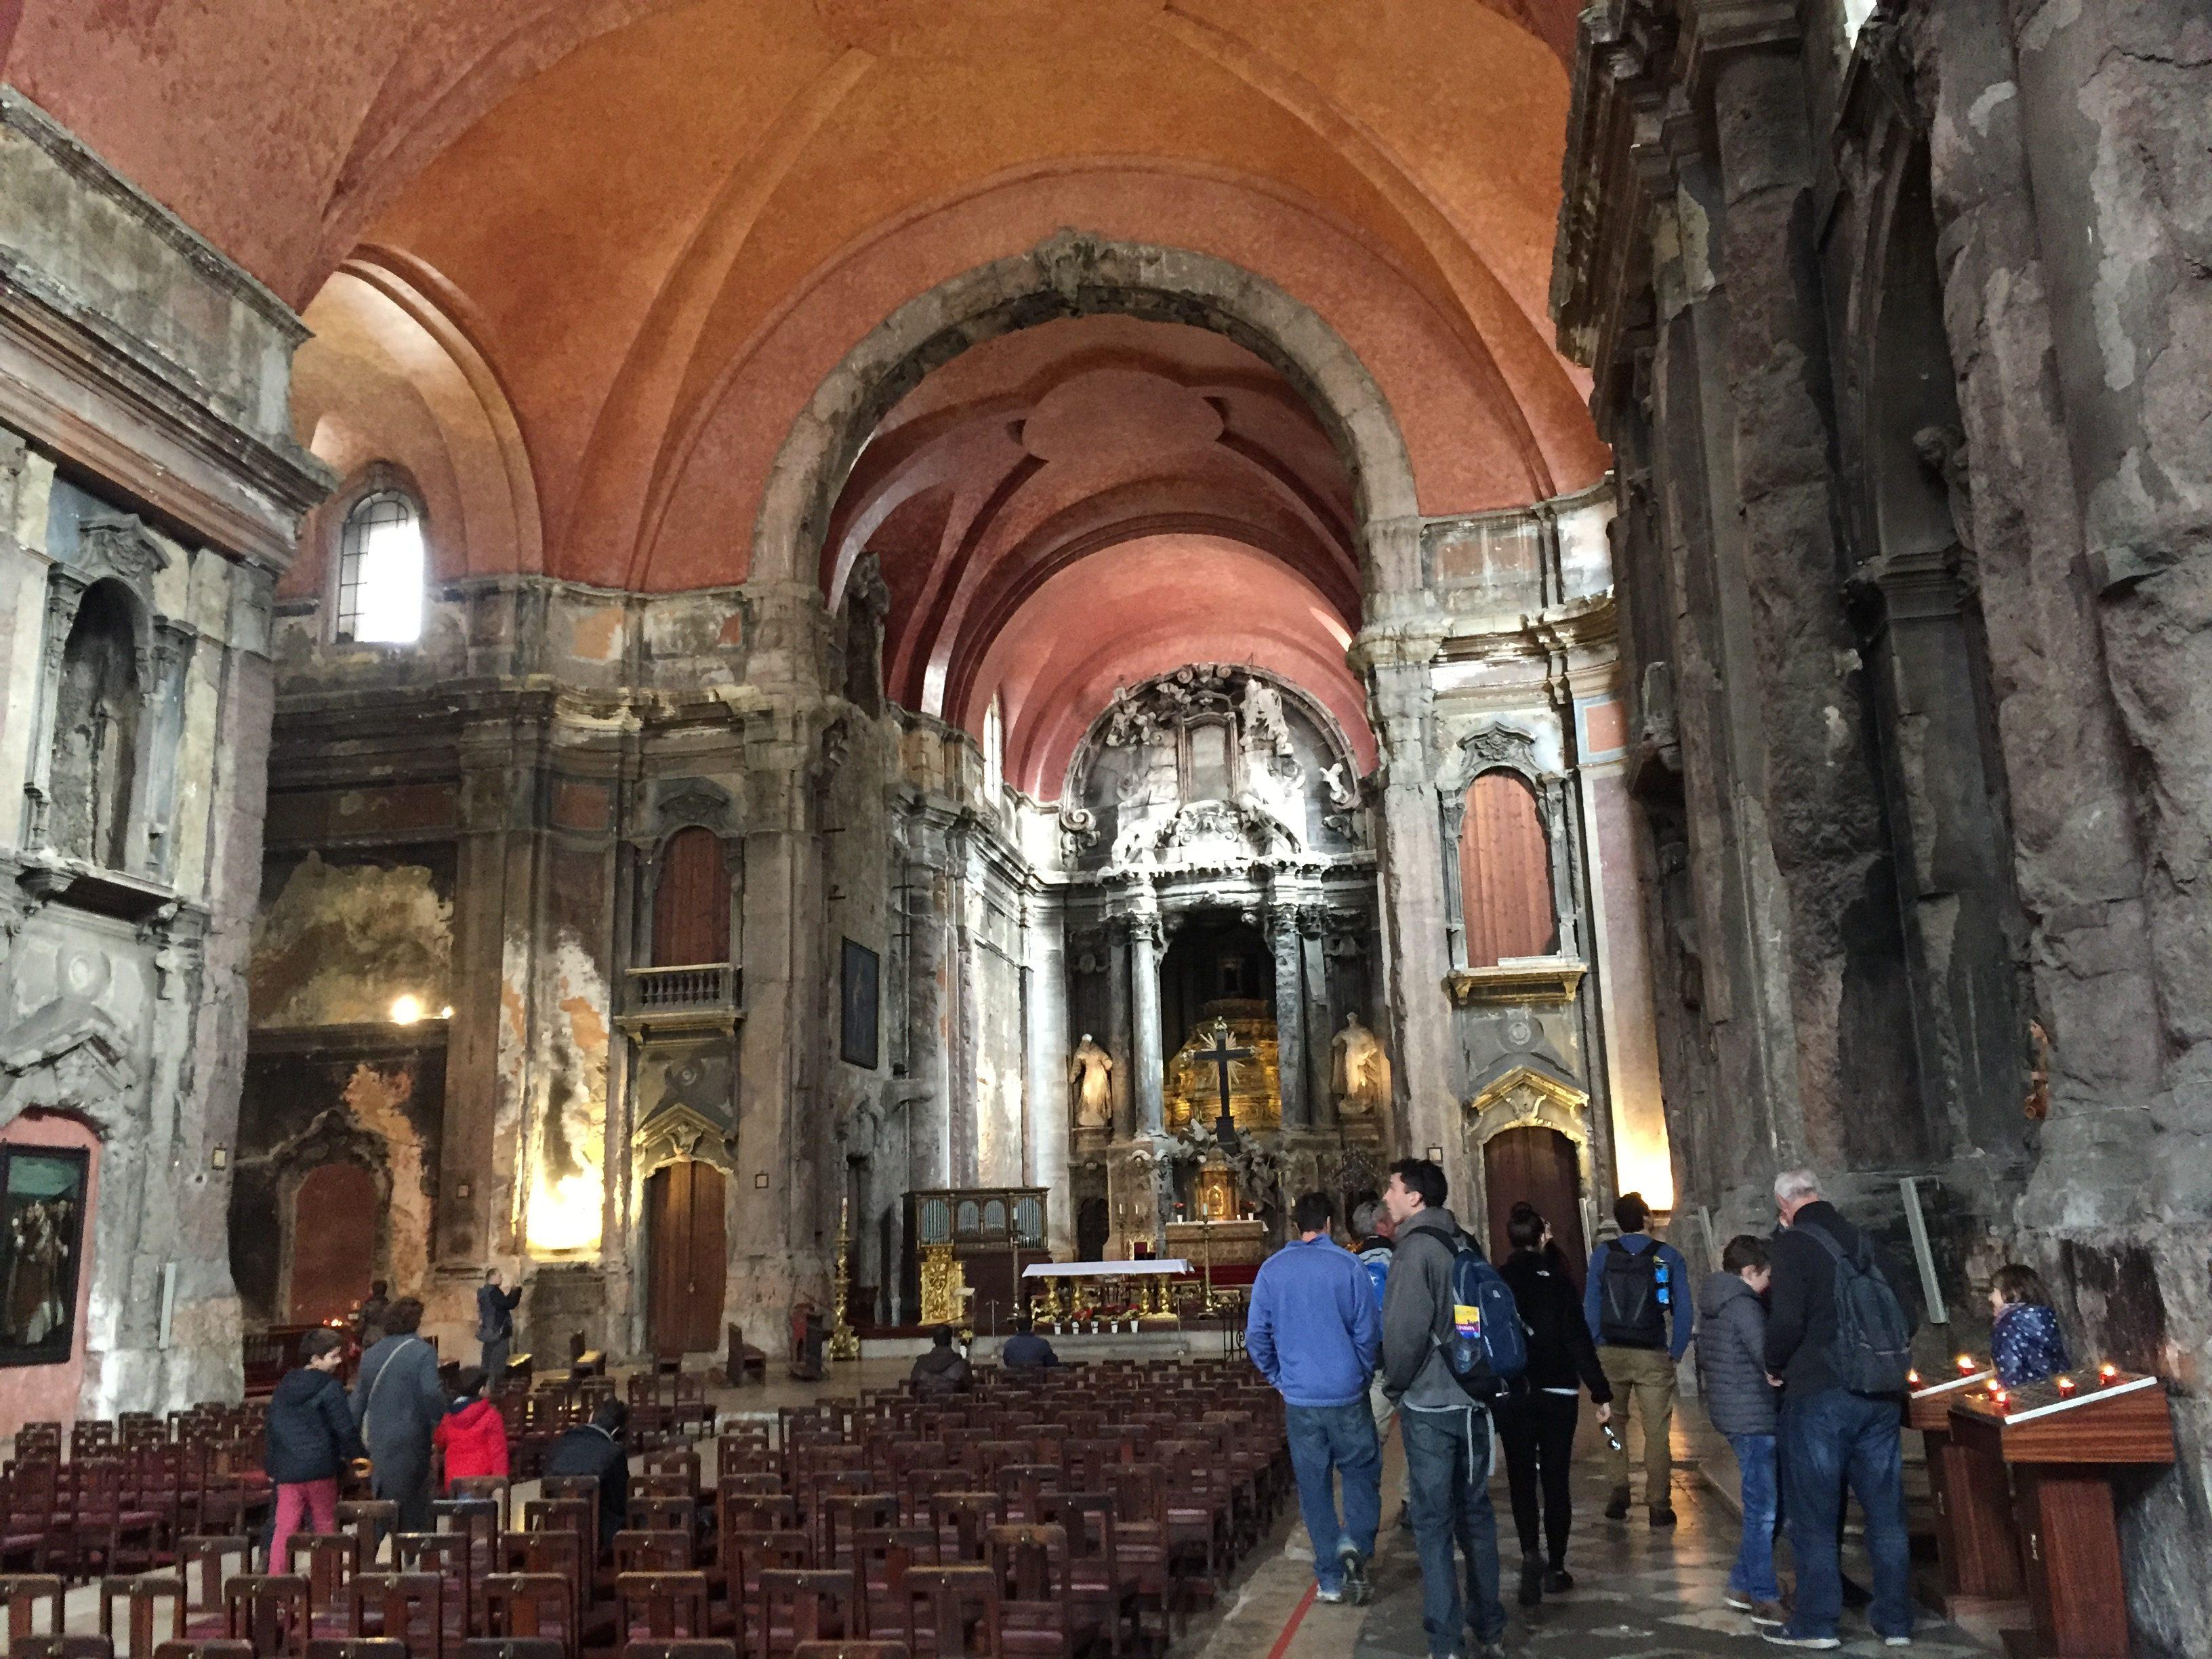 IMG 22971 e1515636852456 - Lugares para visitar en Lisboa (Parte II/II)